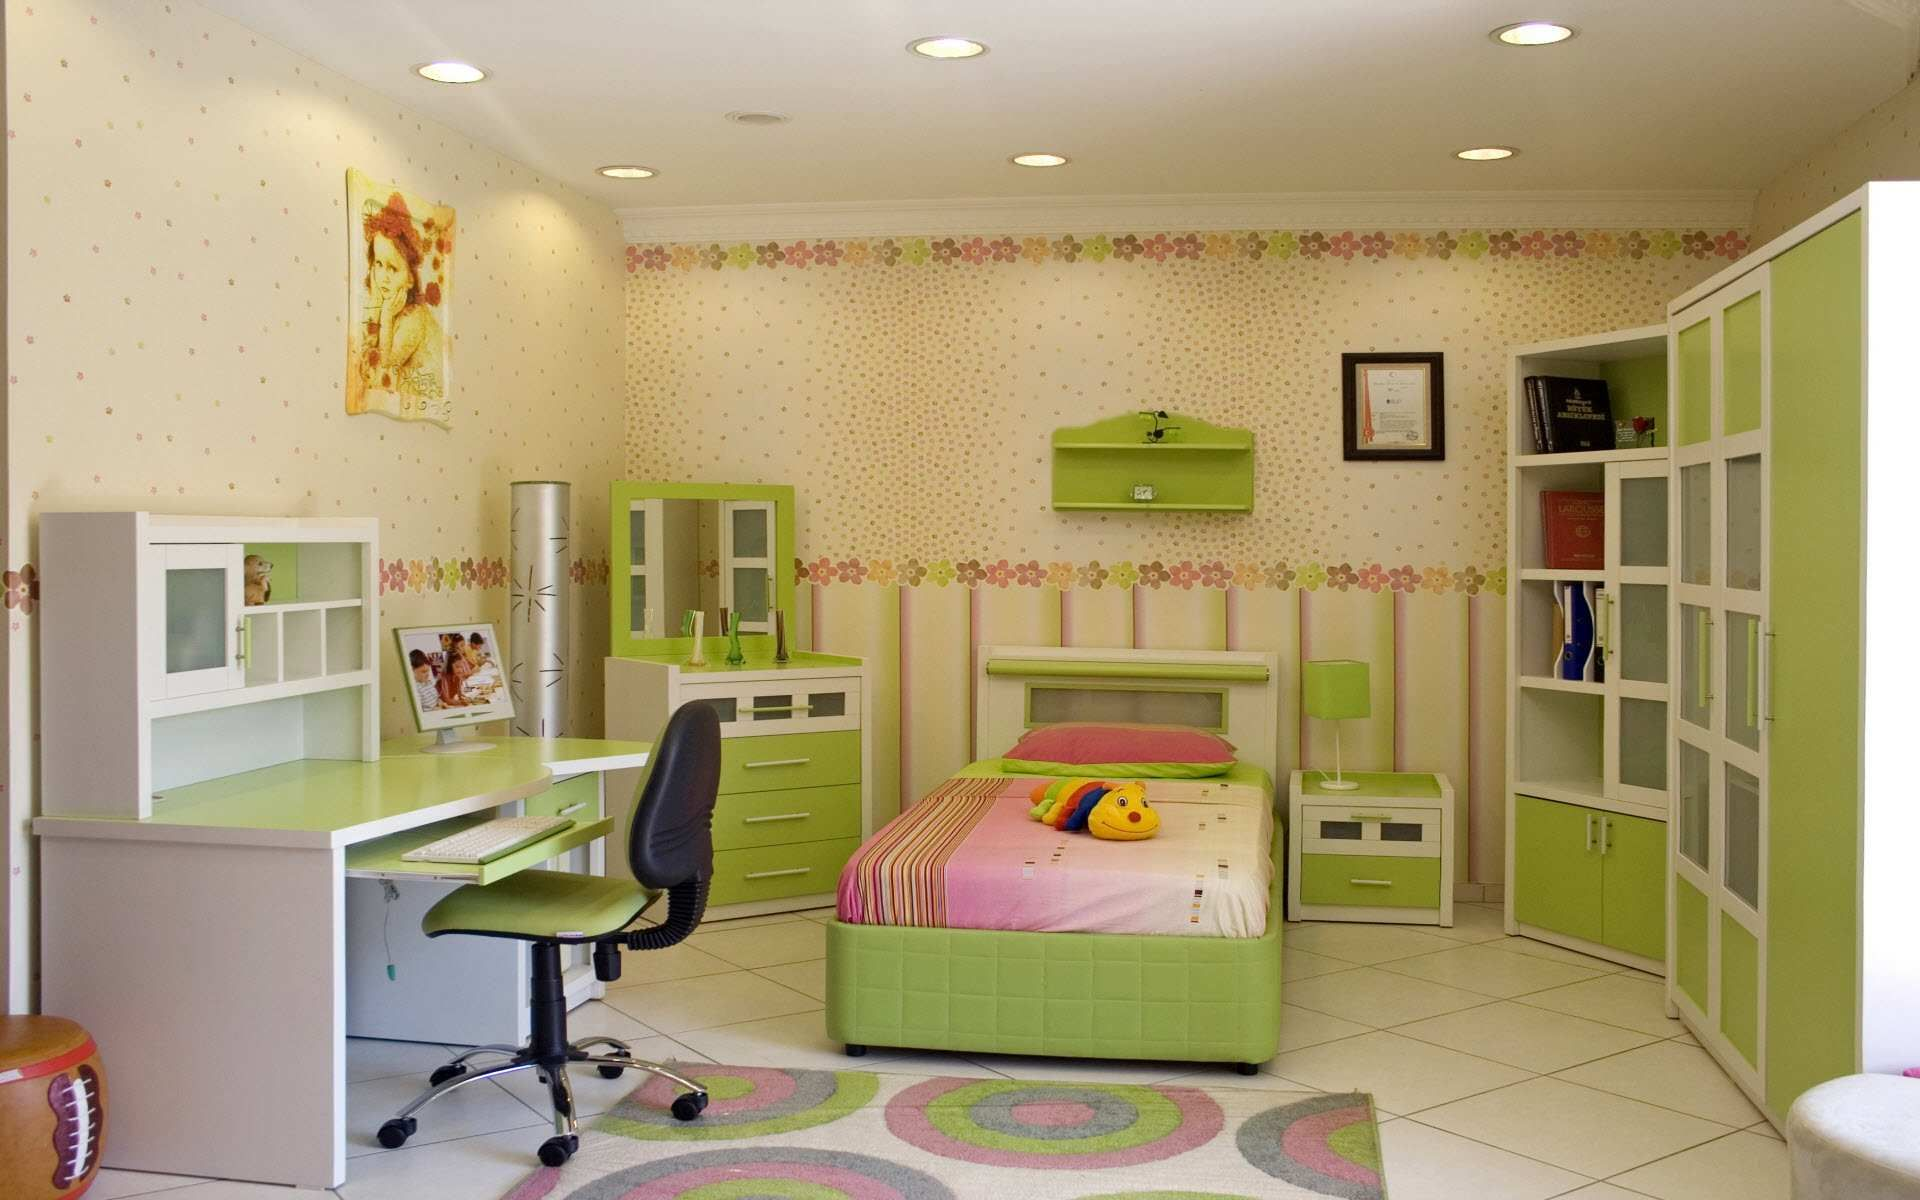 Home interior design photos hd - Scenic Home Designs In House Inspiration Interior Design With White